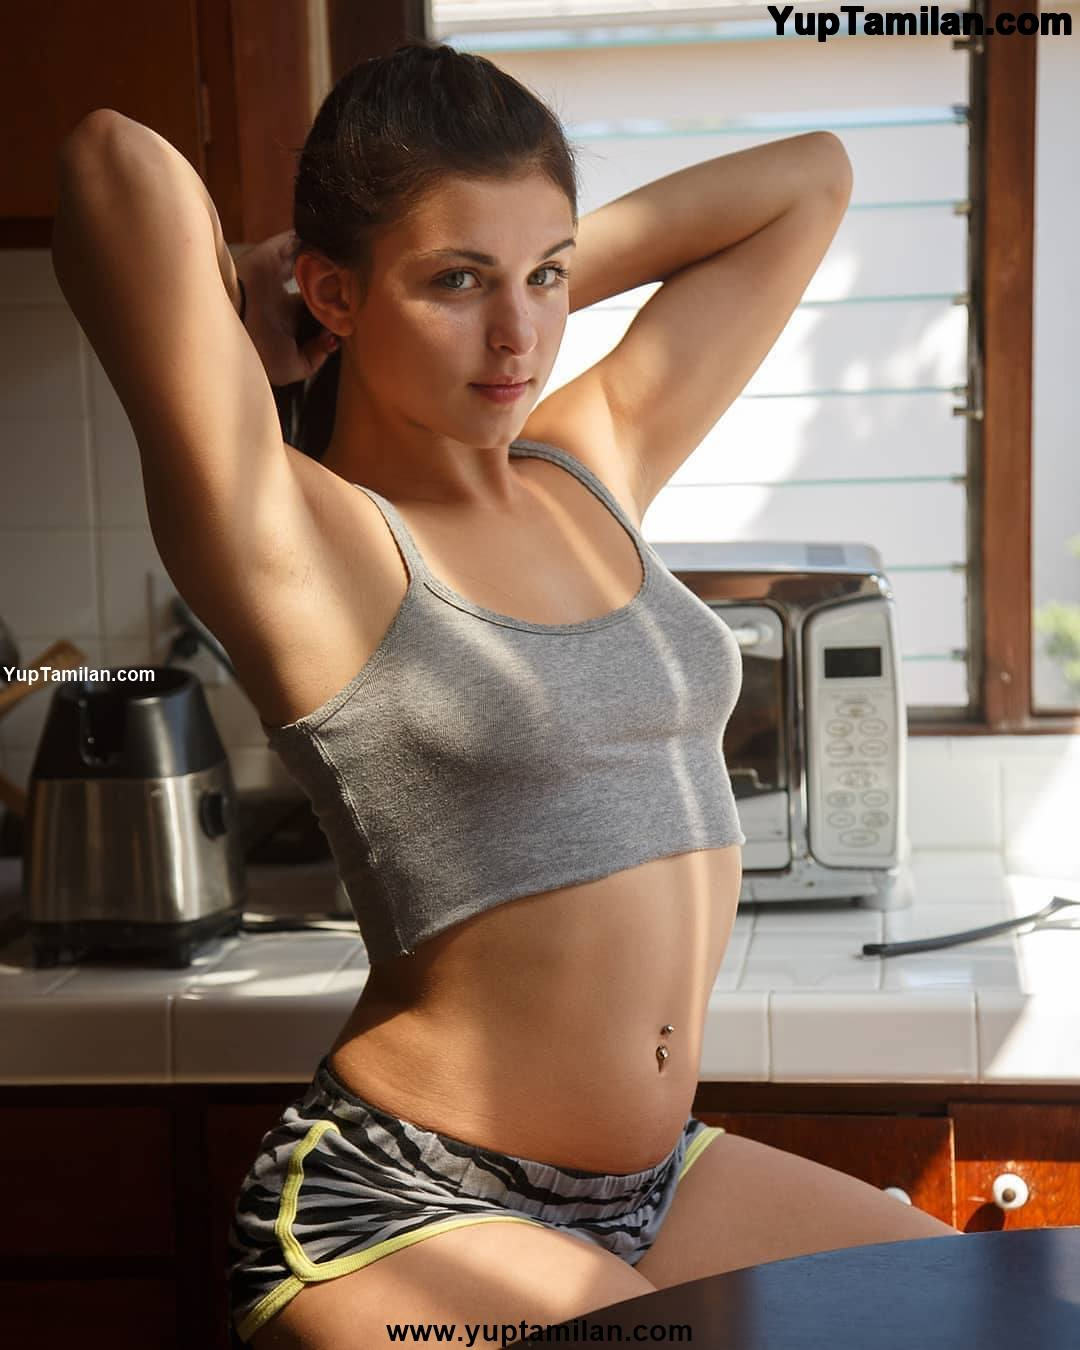 50+ Leah Gotti Sexiest Bikini,Bra Photos-Seducing HD Images